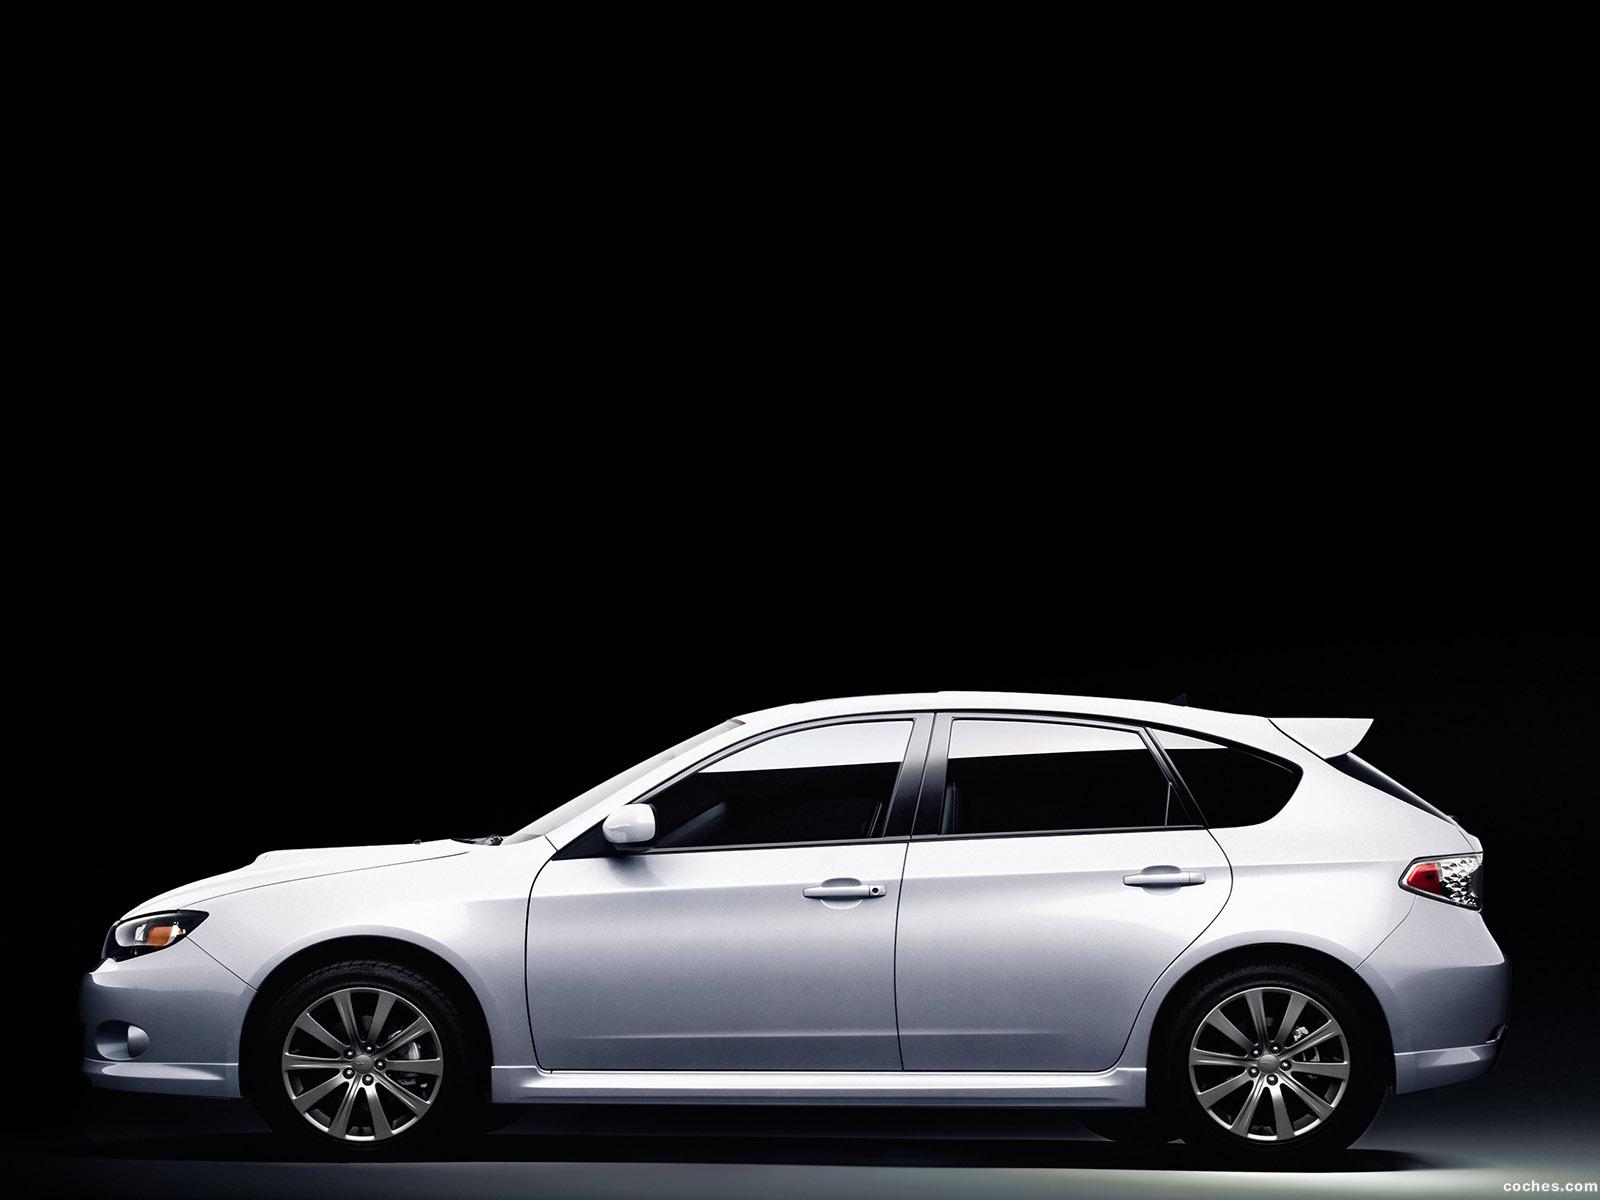 Foto 0 de Subaru Impreza WRX Limited Edition USA 2010